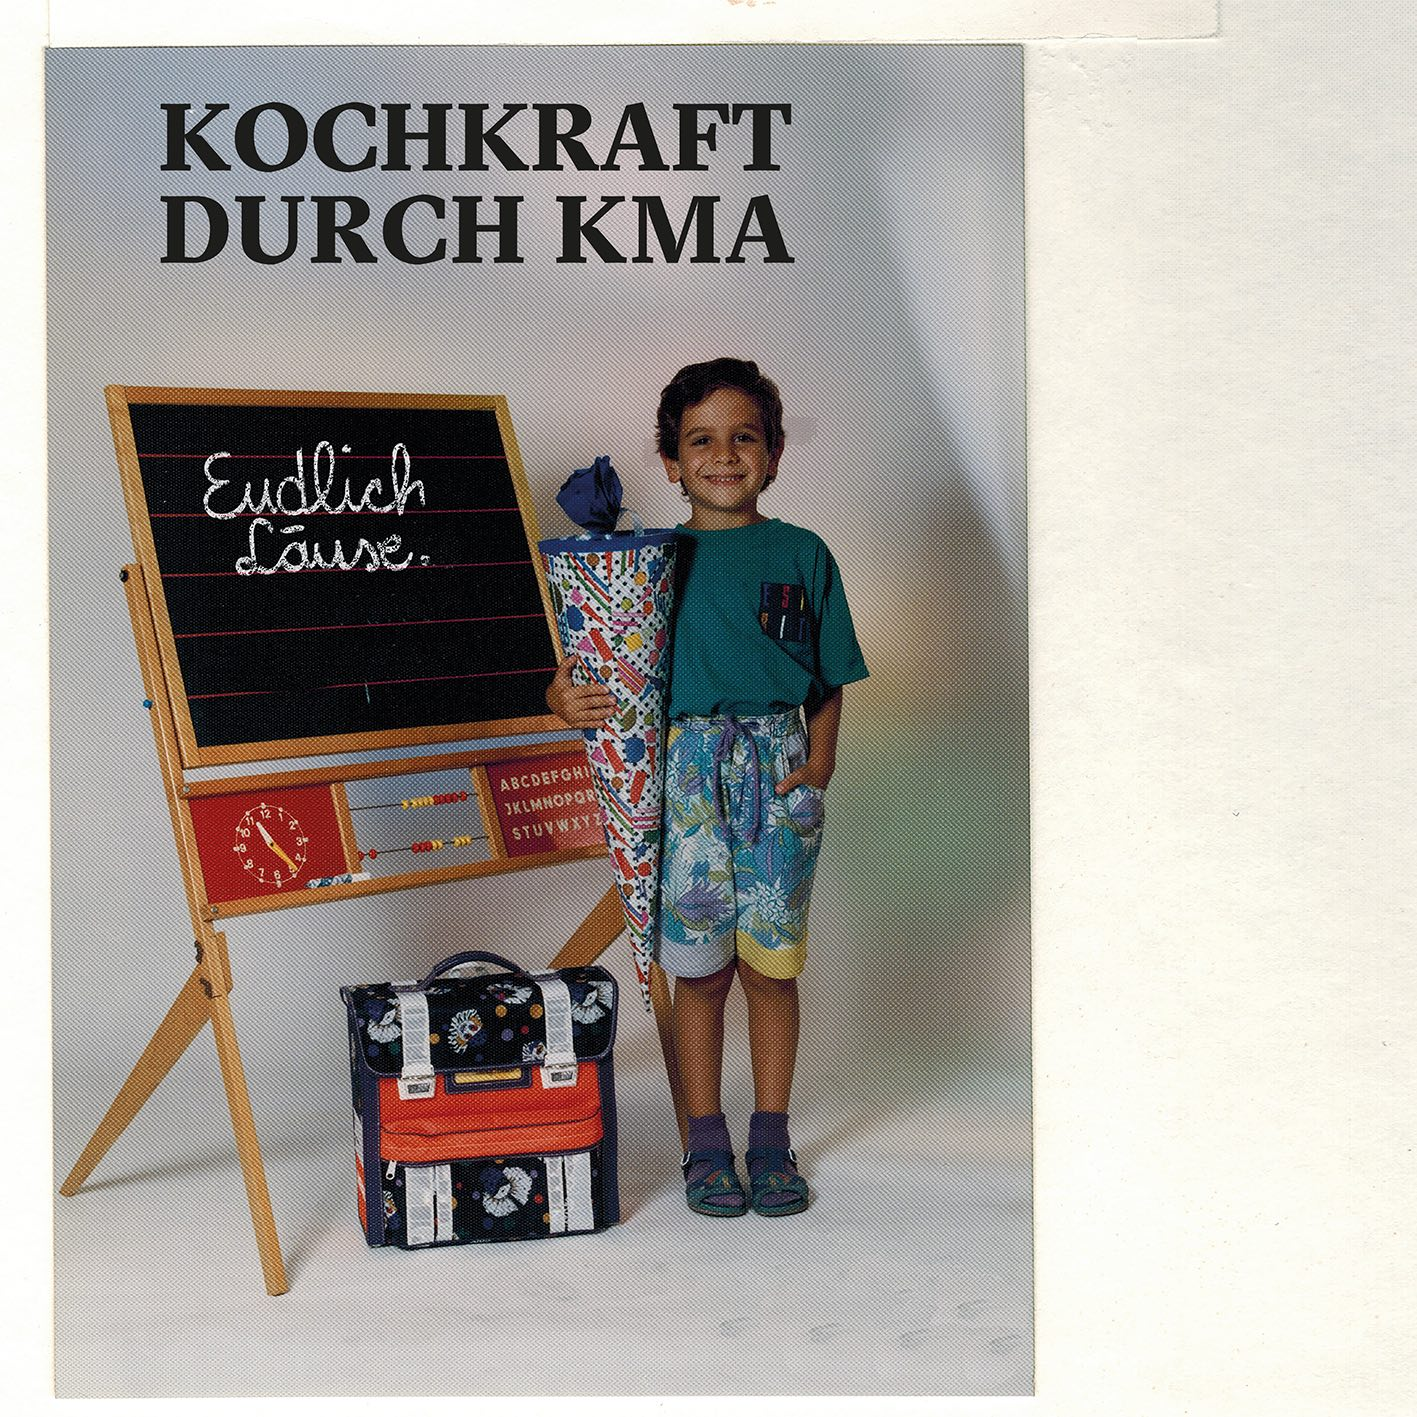 ENDLICH LÄUSE  (Vinyl/Streaming/CD)   -> hier geht's zum SHOP